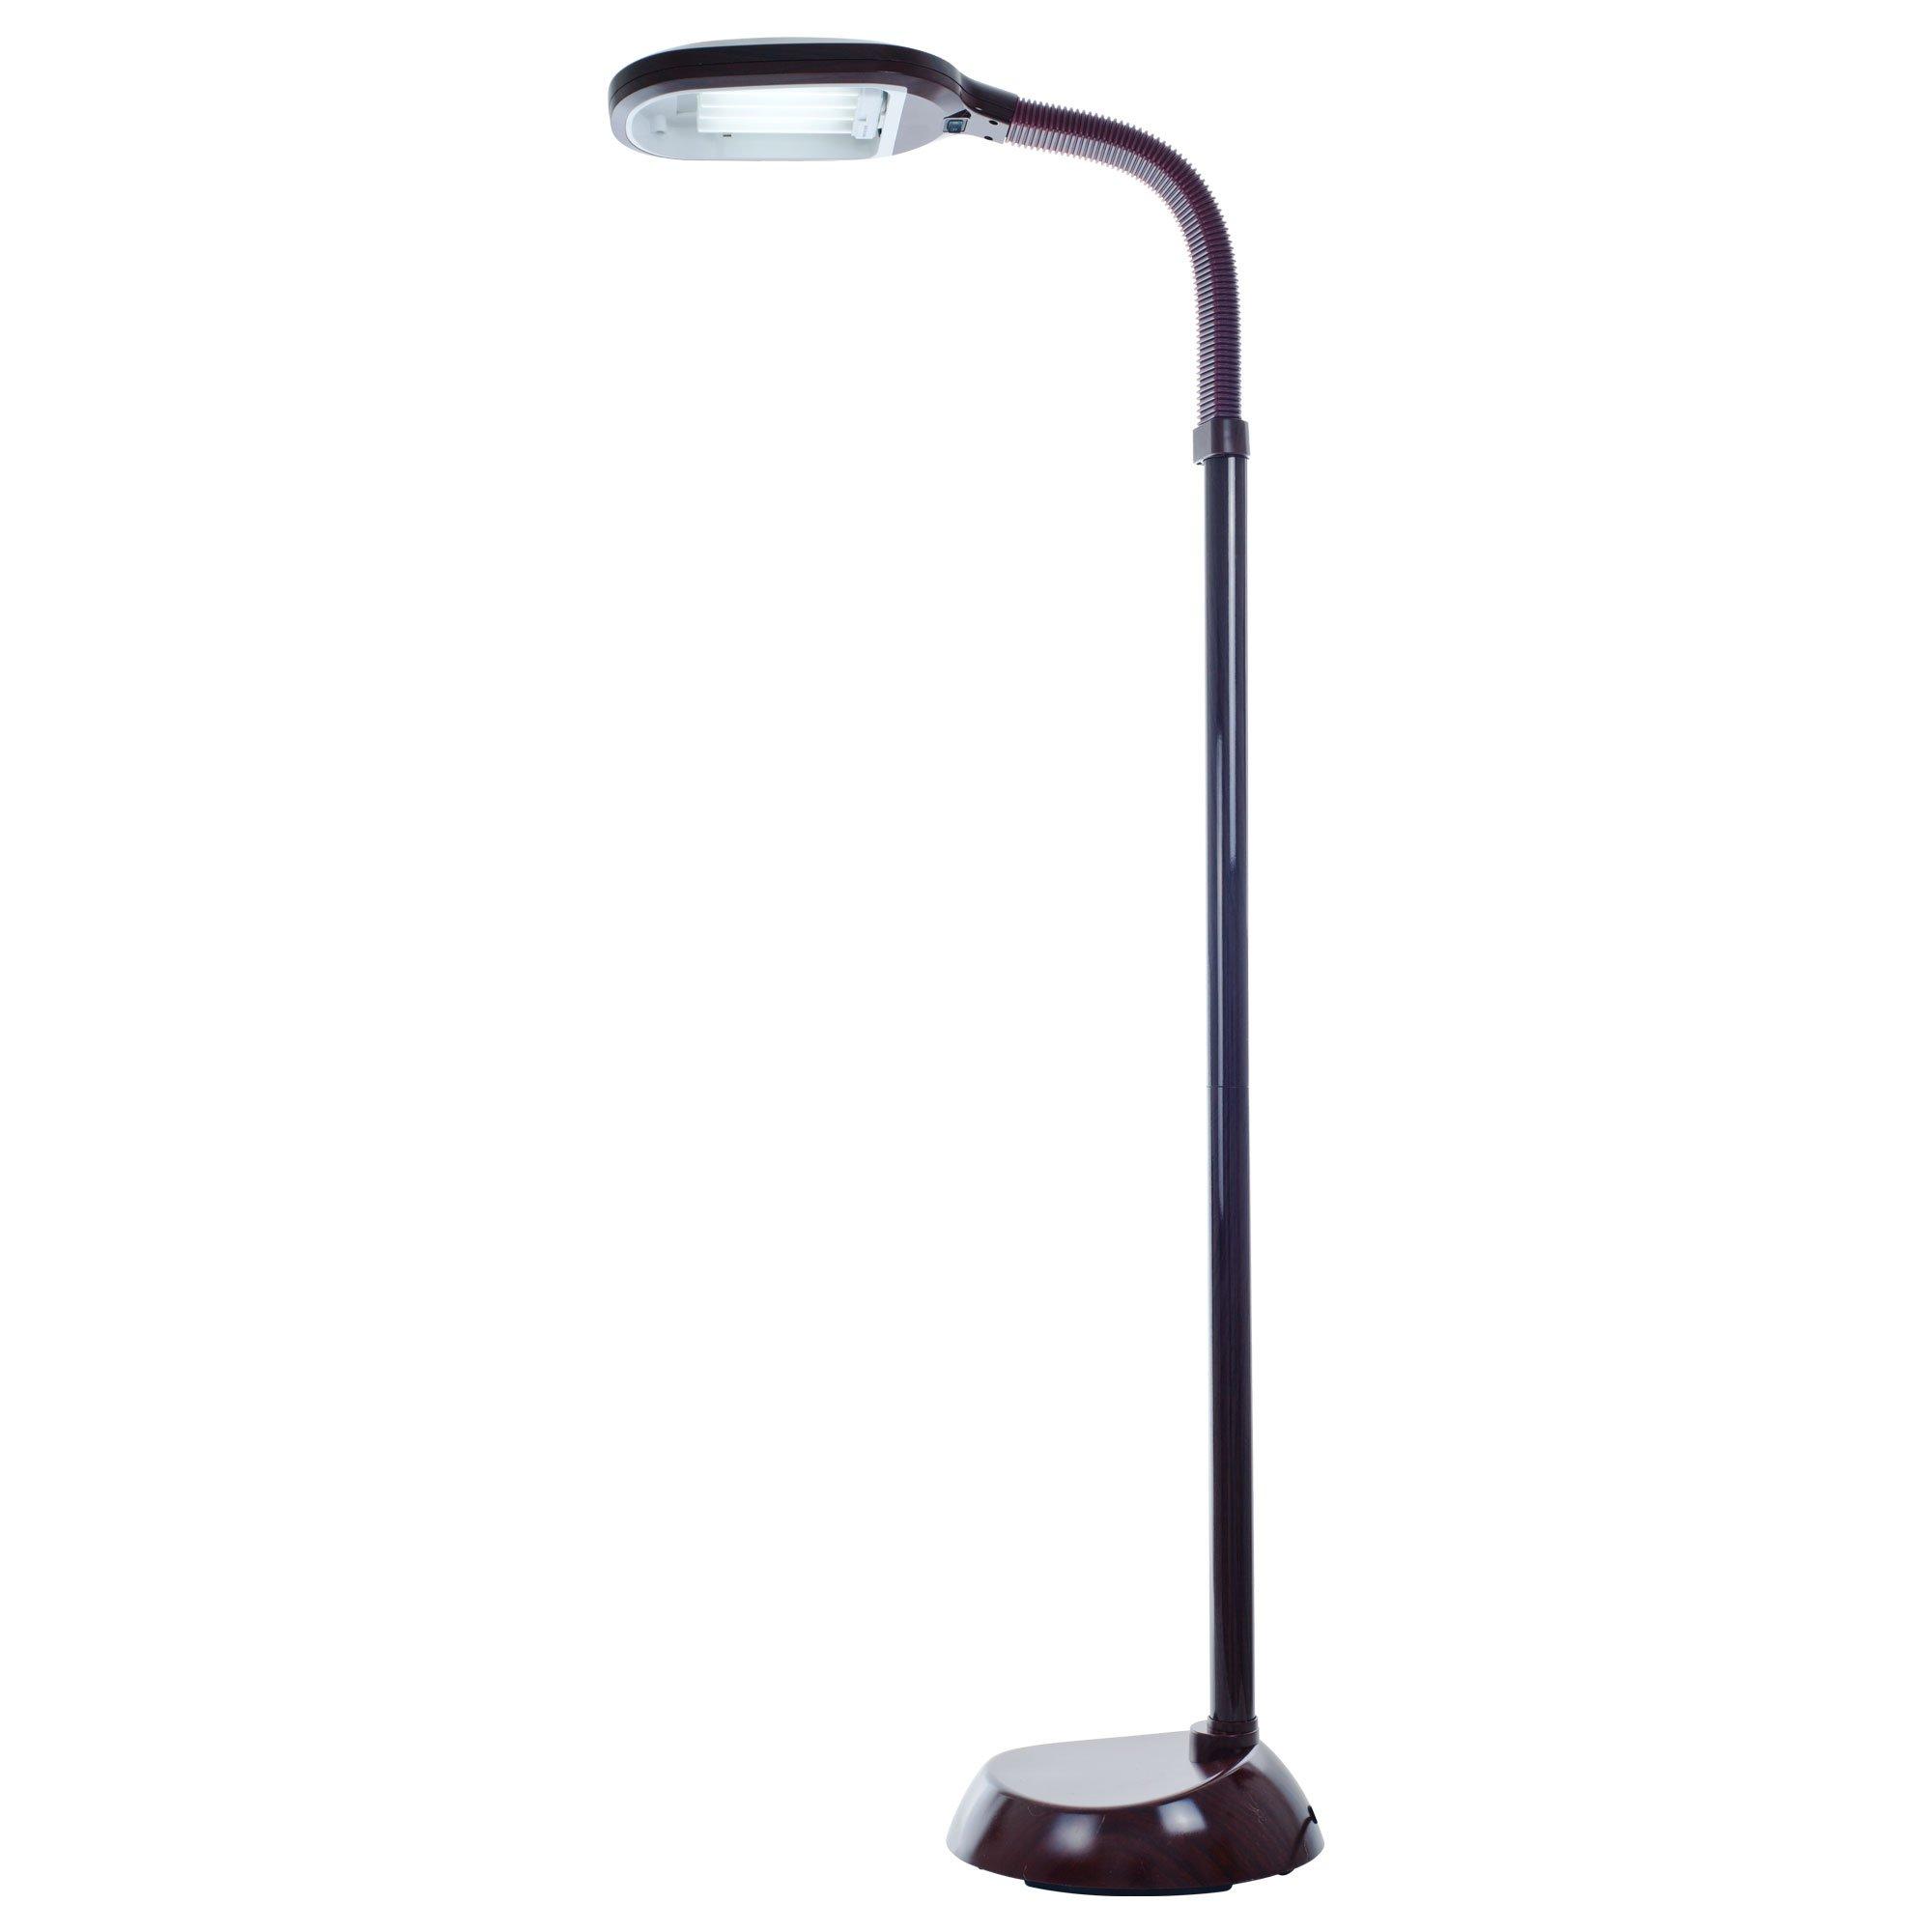 Bedford Home 72A-1438 Sunlight Floor Lamp 5 Feet, Wood Grain